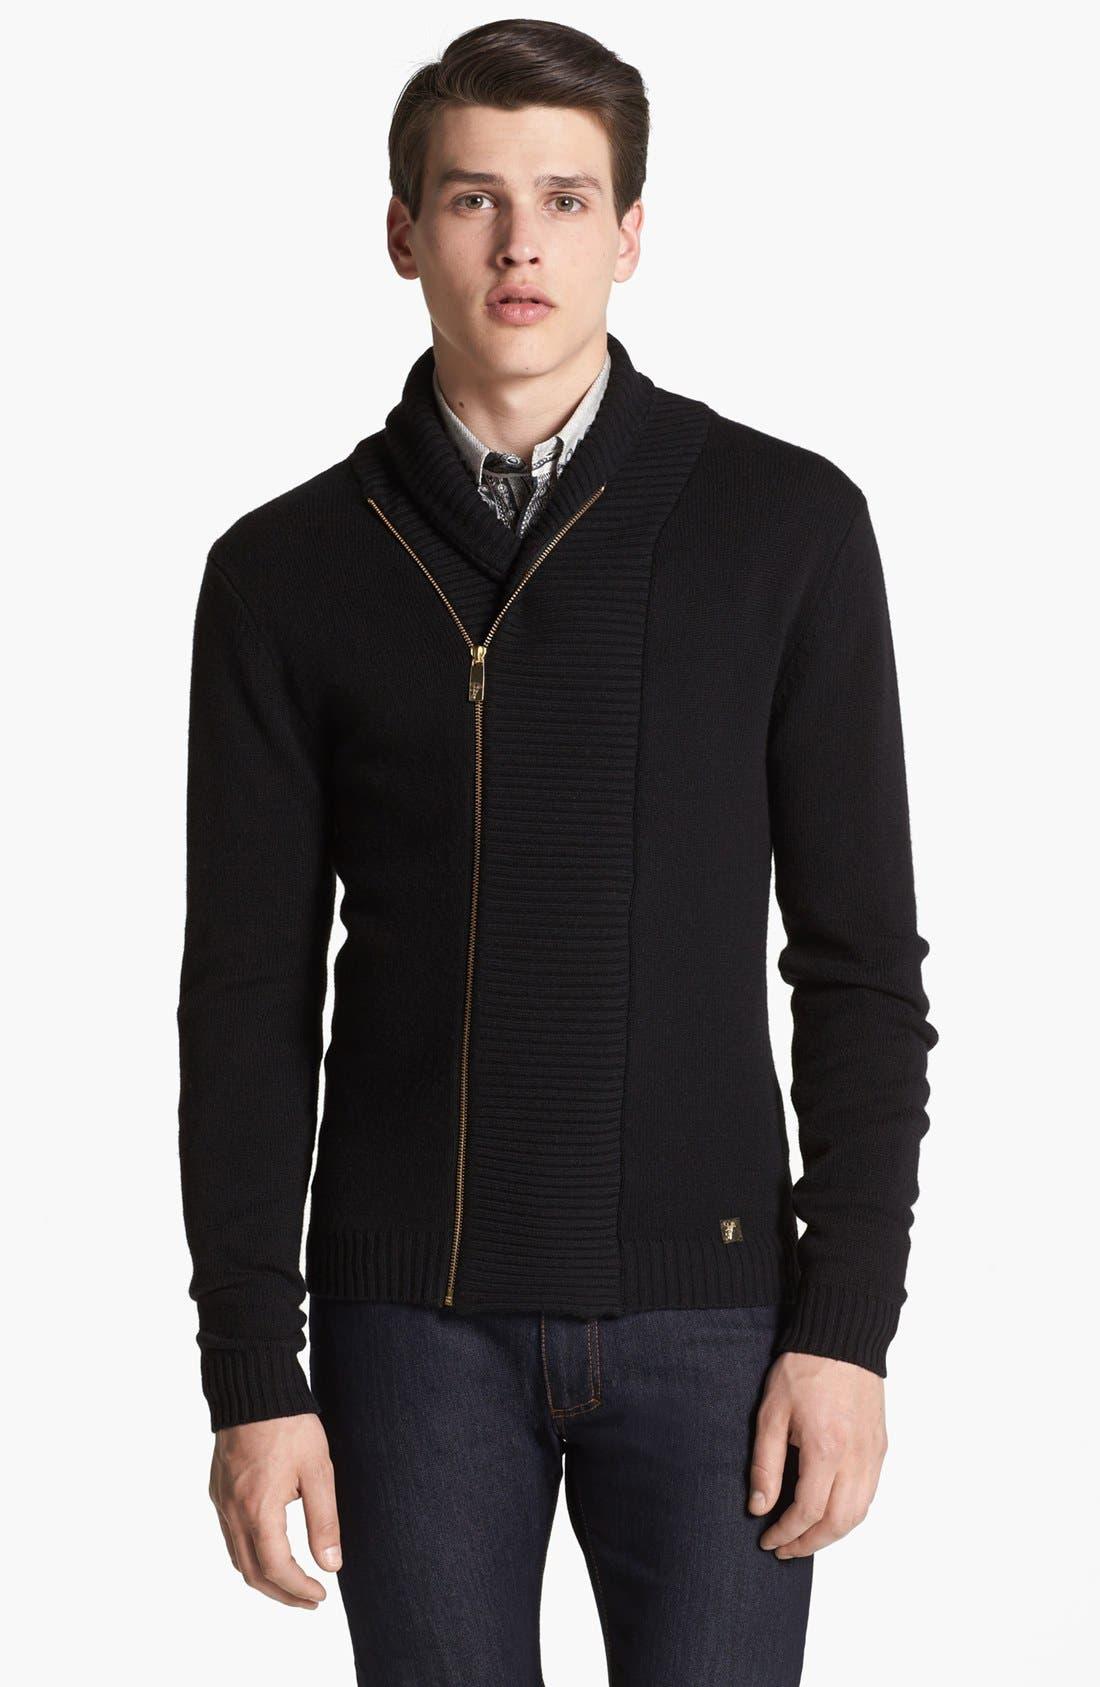 Alternate Image 1 Selected - Versace Shawl Collar Sweater